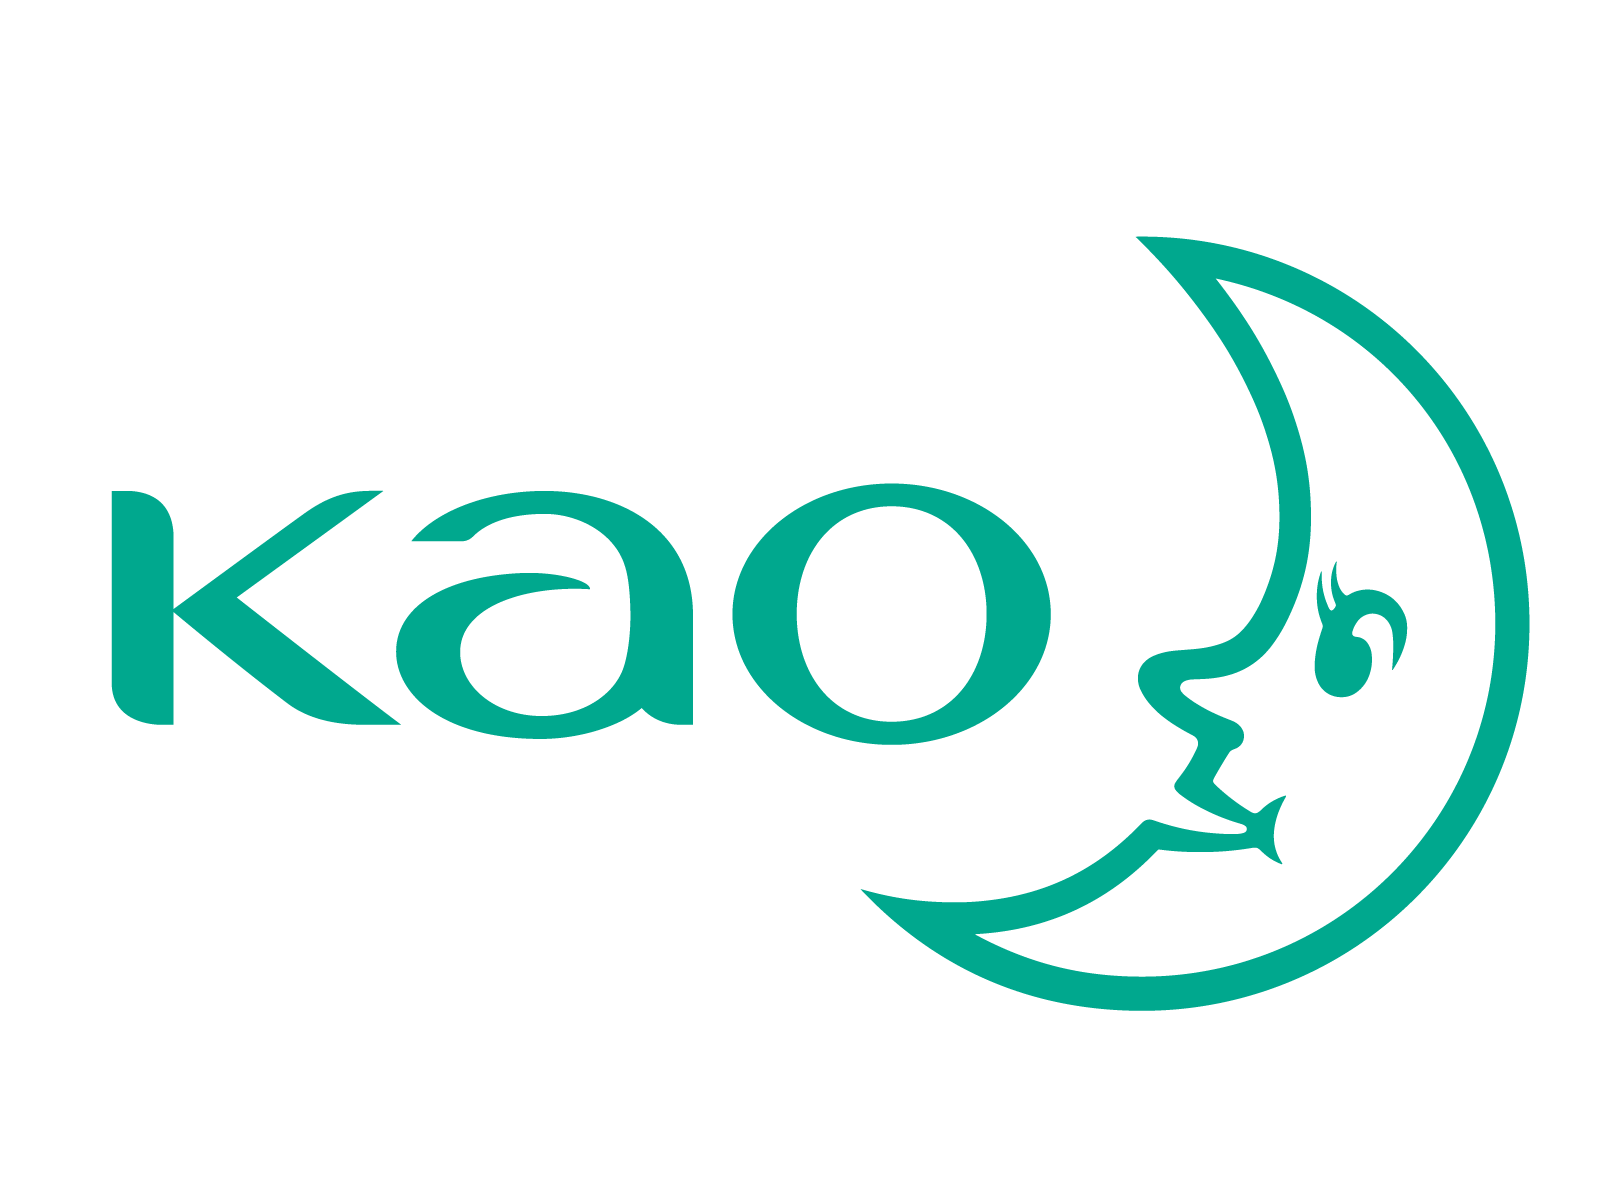 Kao-logo-moon